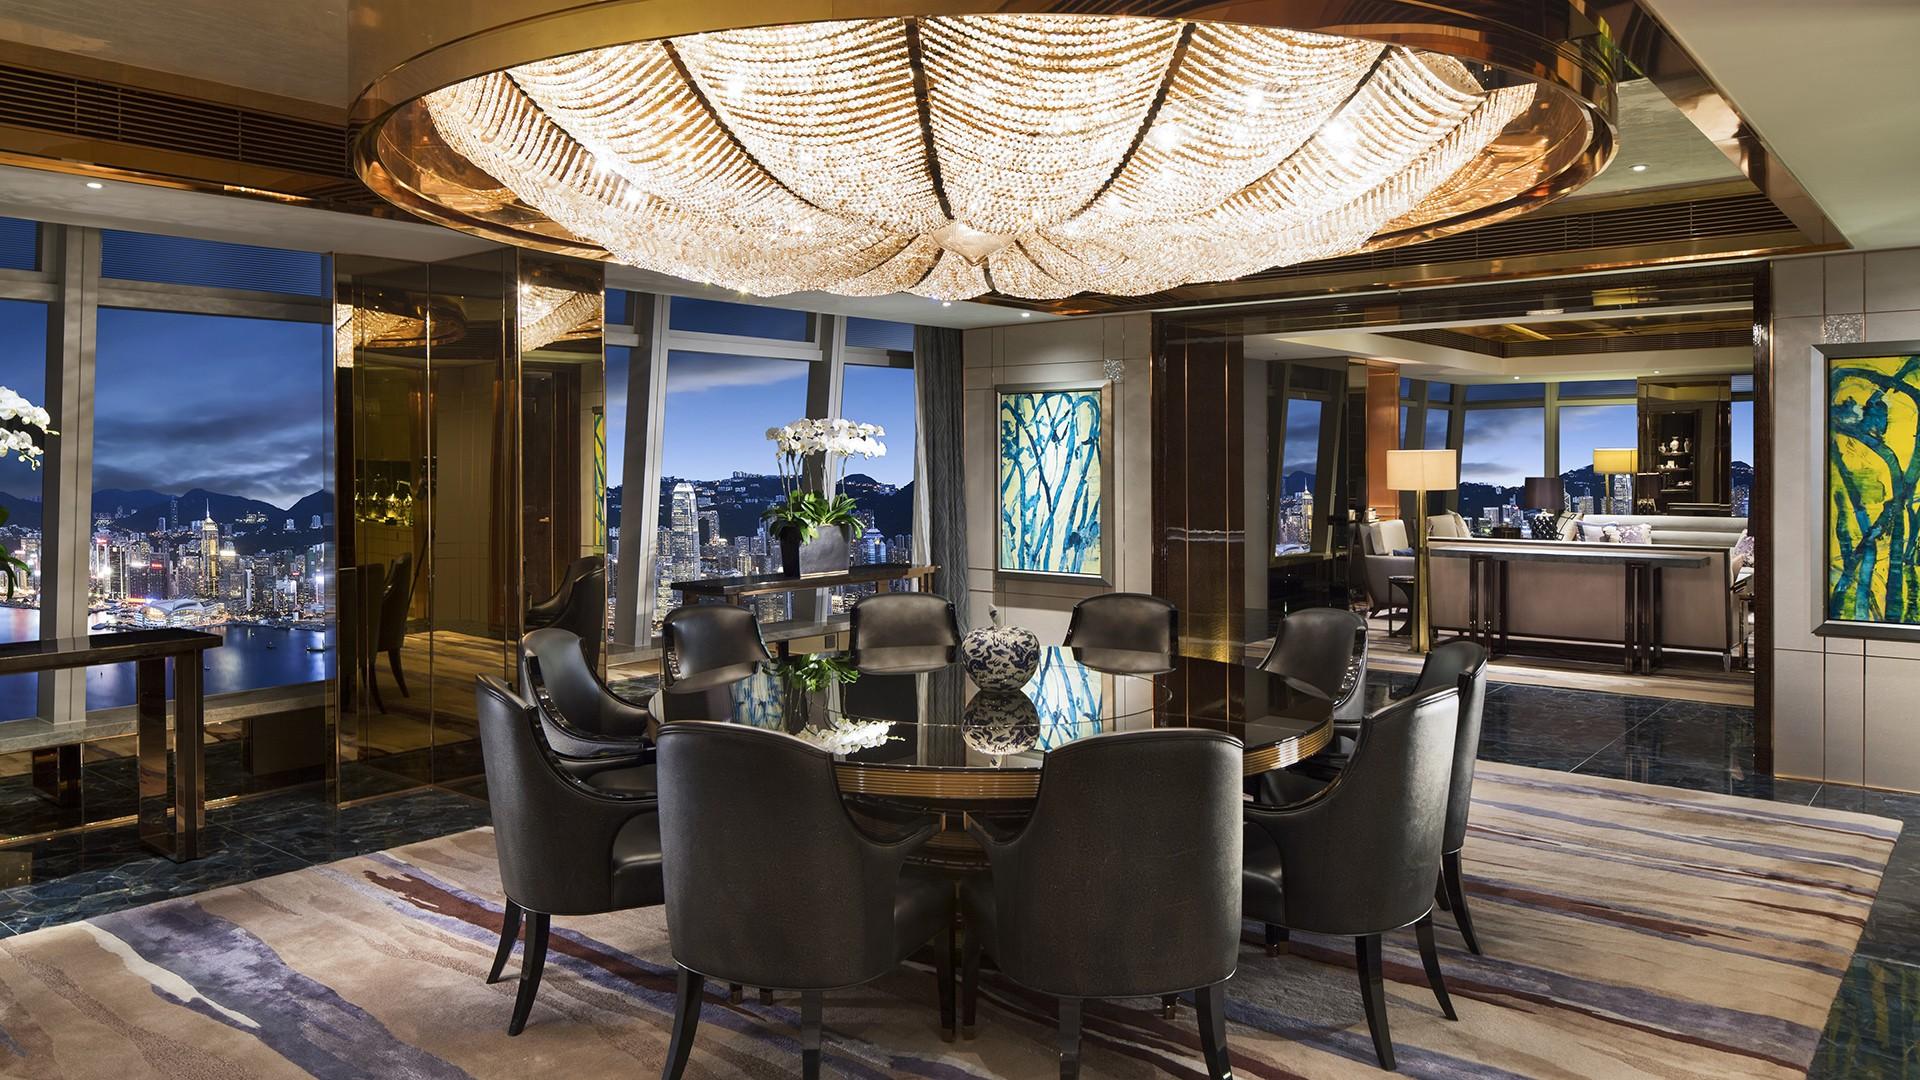 Ritz-Carlton Suite,The Ritz-Carlton